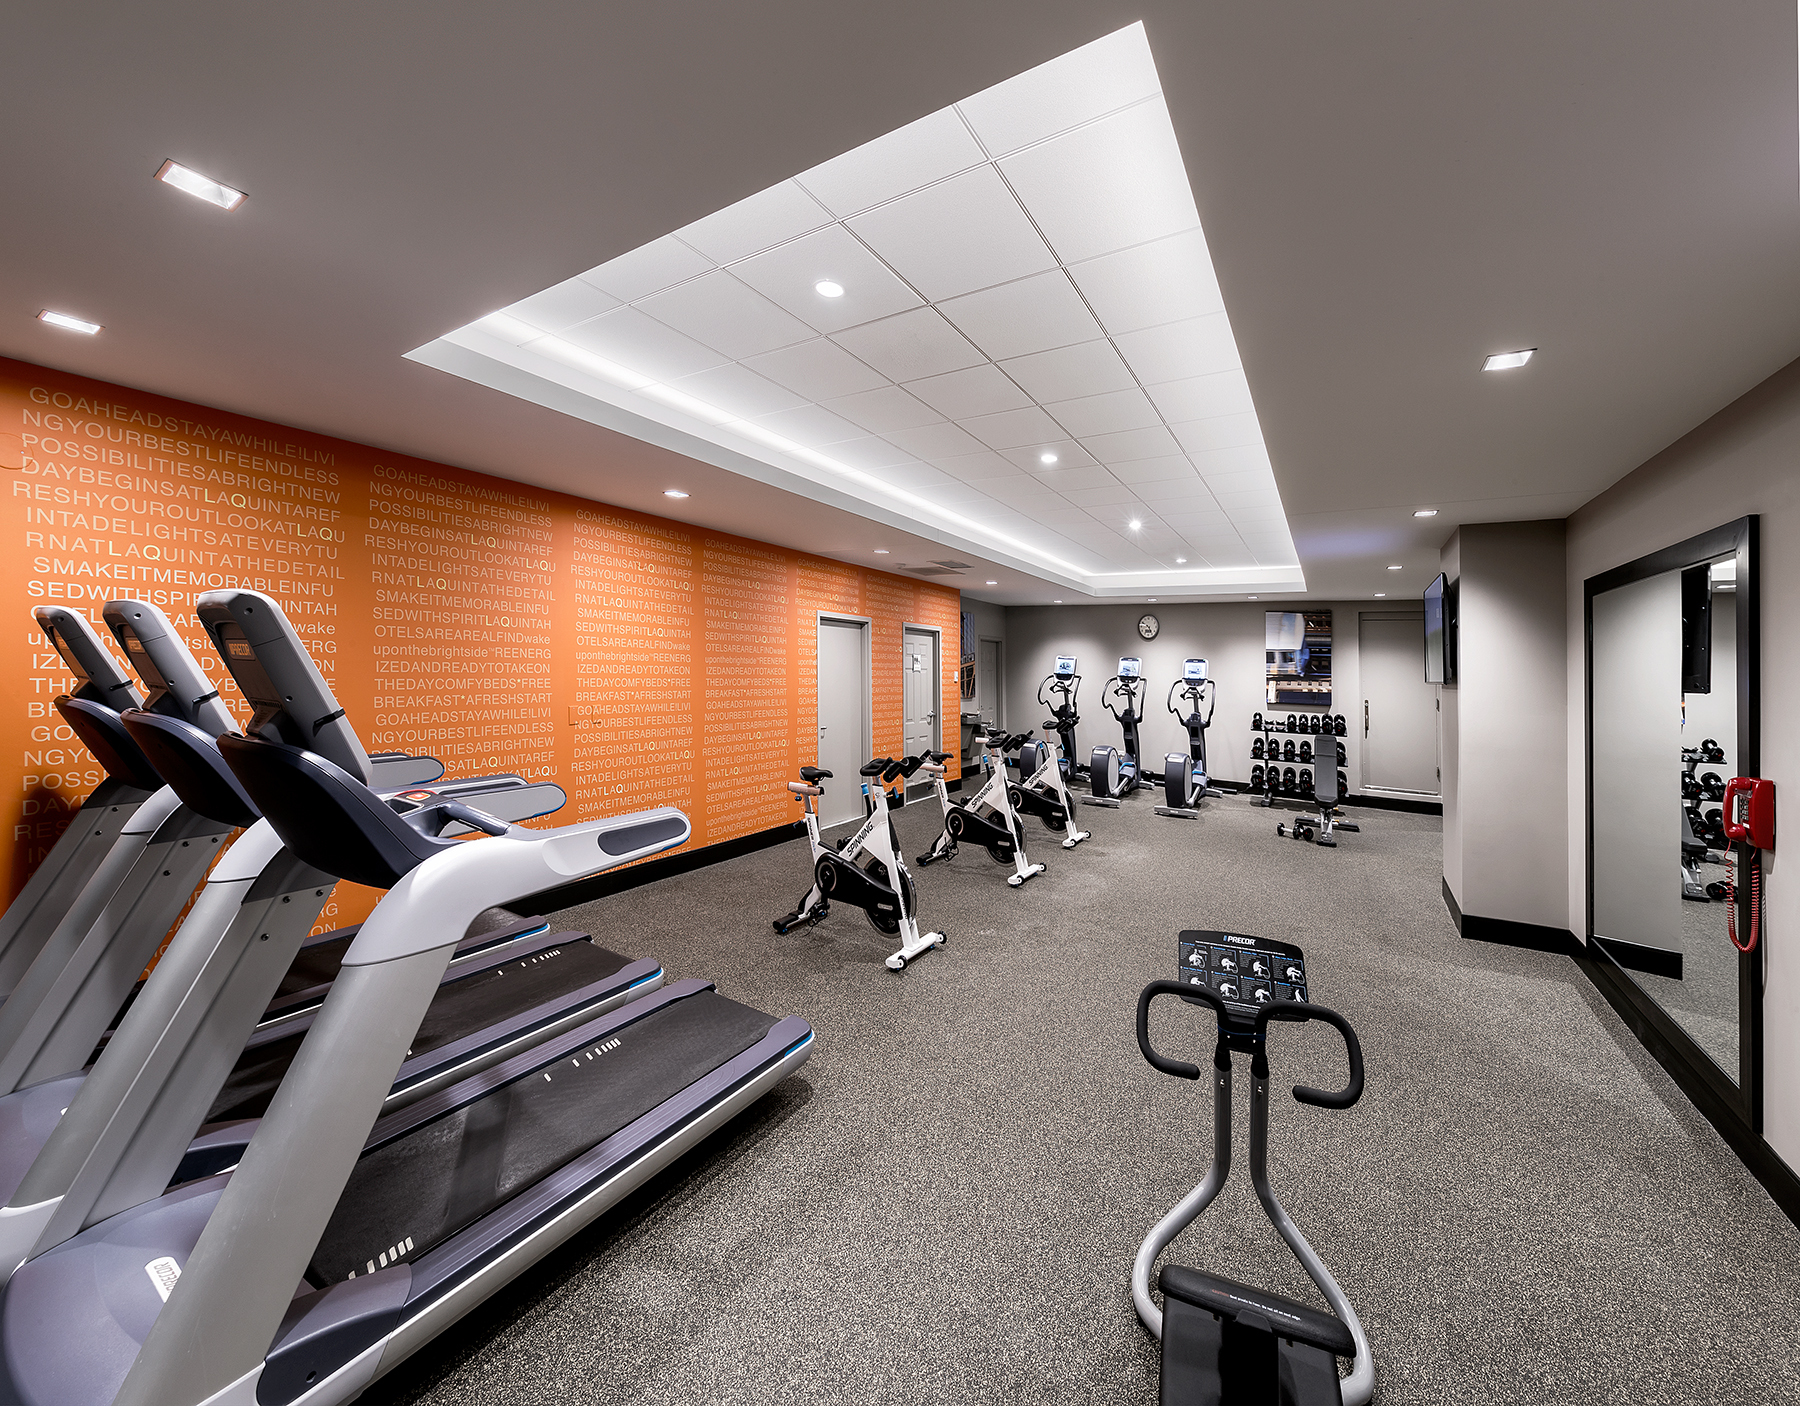 LaQuinta_ChicagoIllinois_FitnessRoom01_B